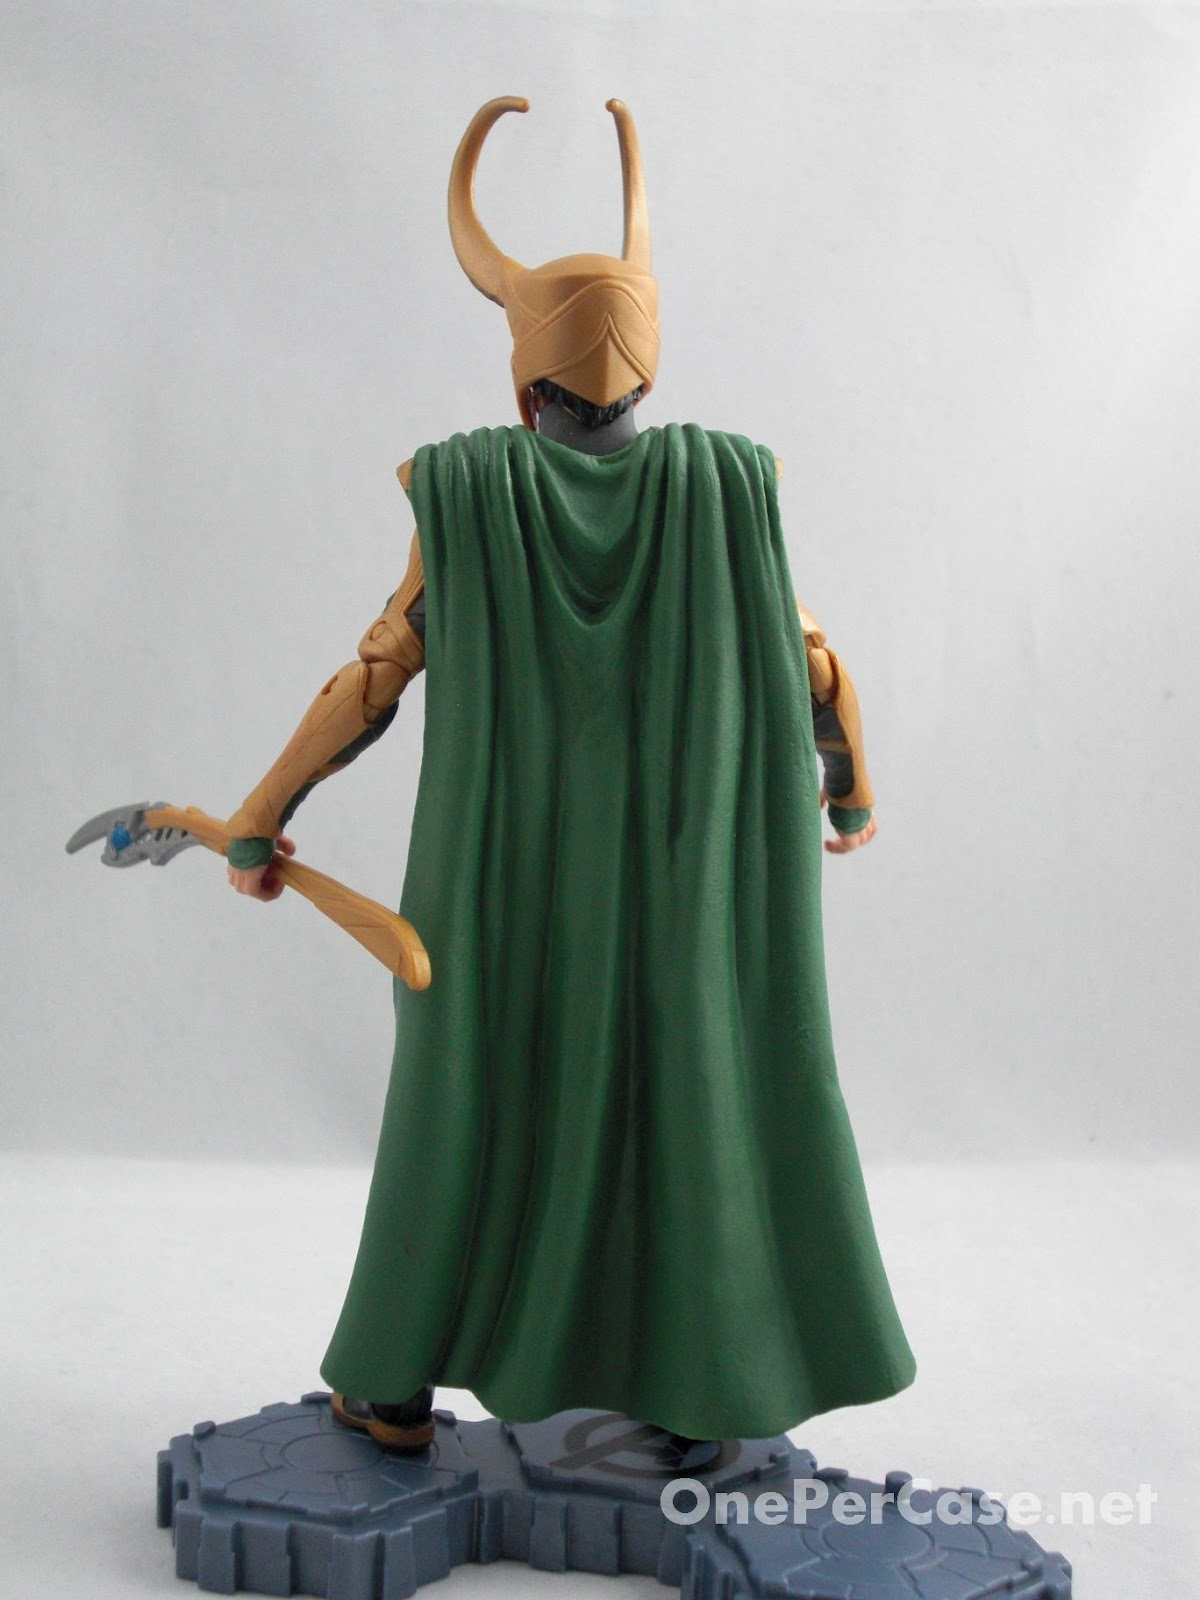 6815fabf781aae One Per Case  Avengers 6 Inch Loki - Walmart Exclusive